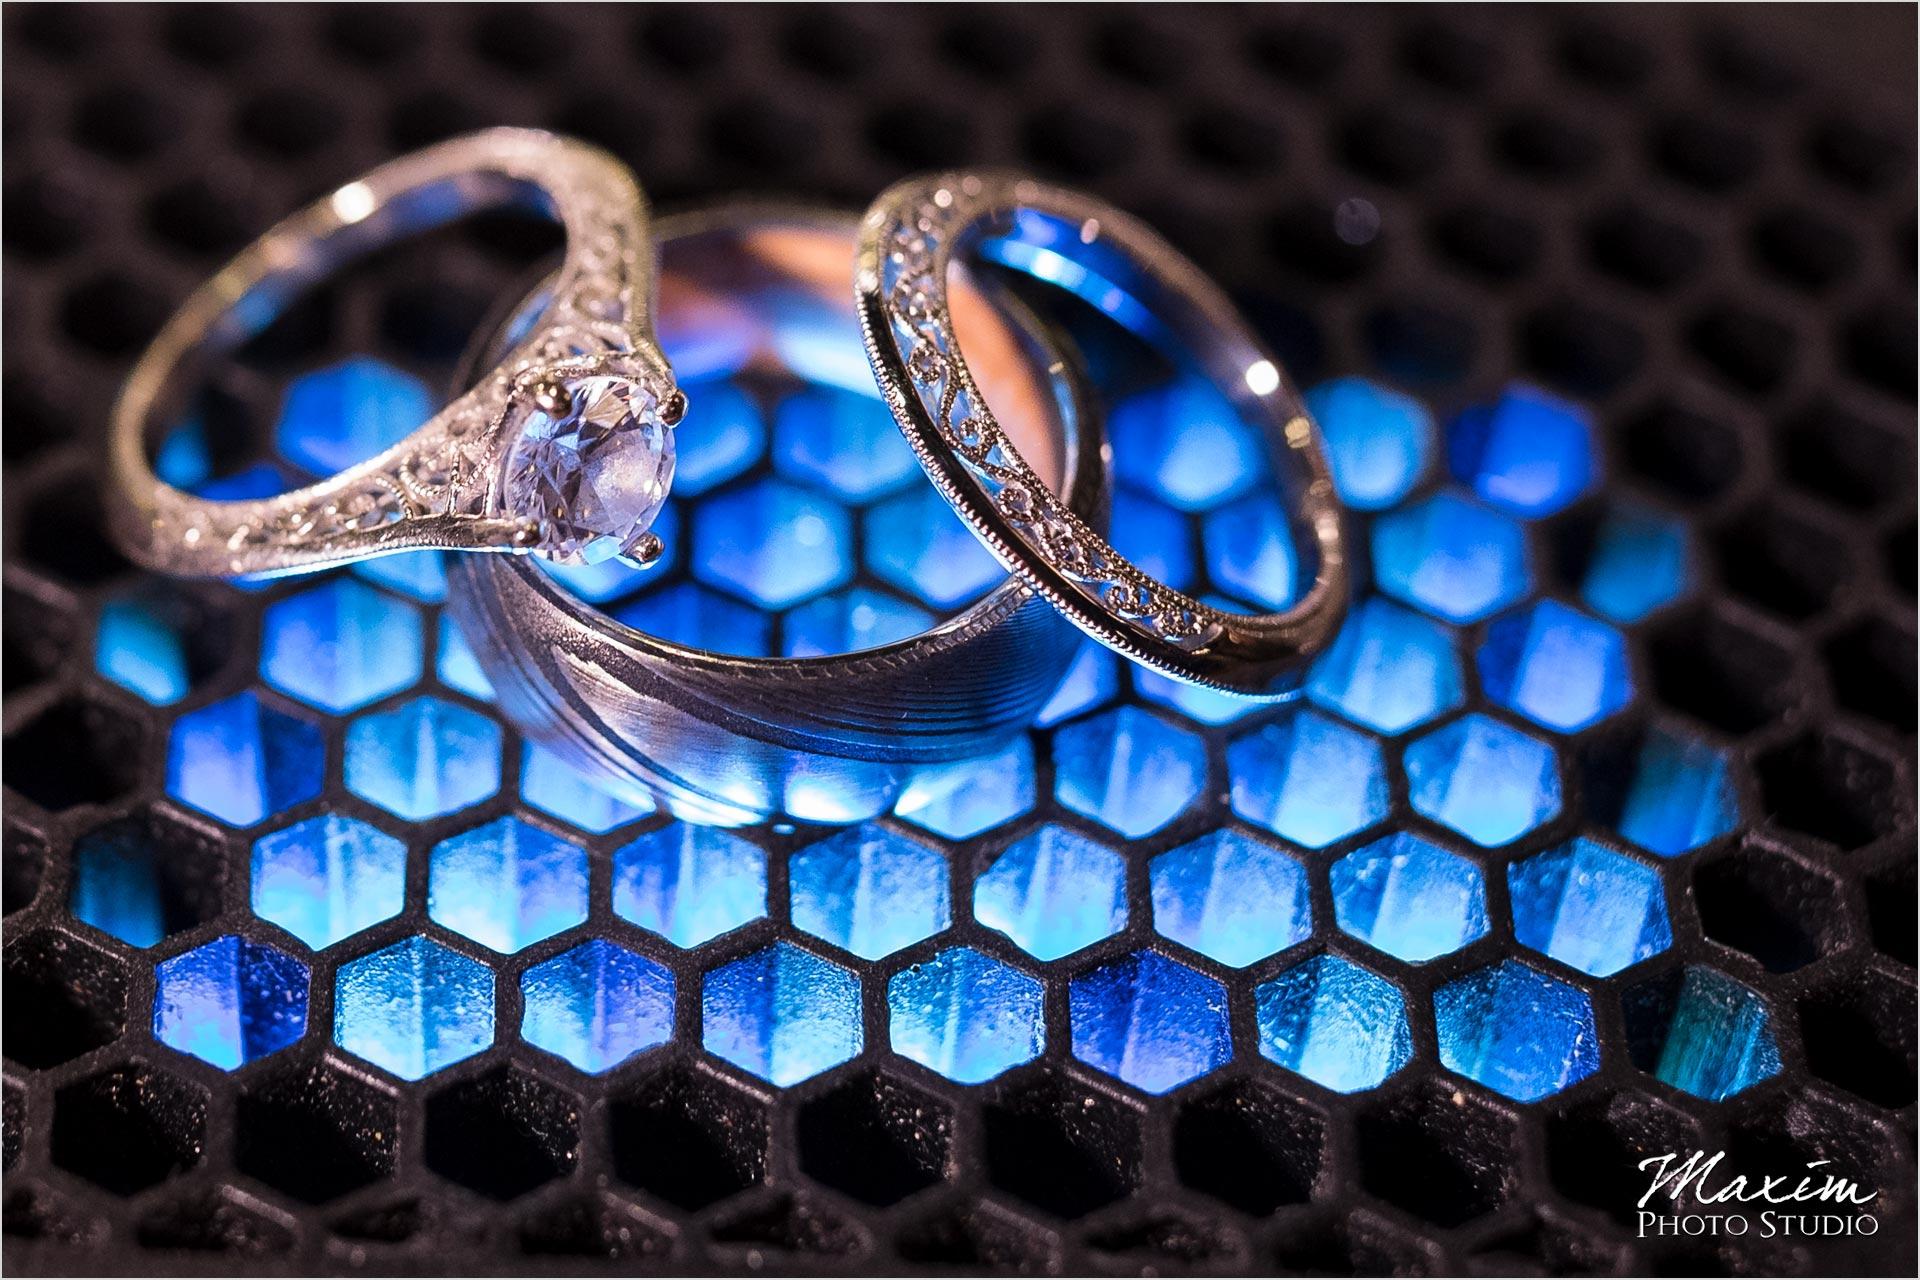 New Riff Brewery Wedding rings